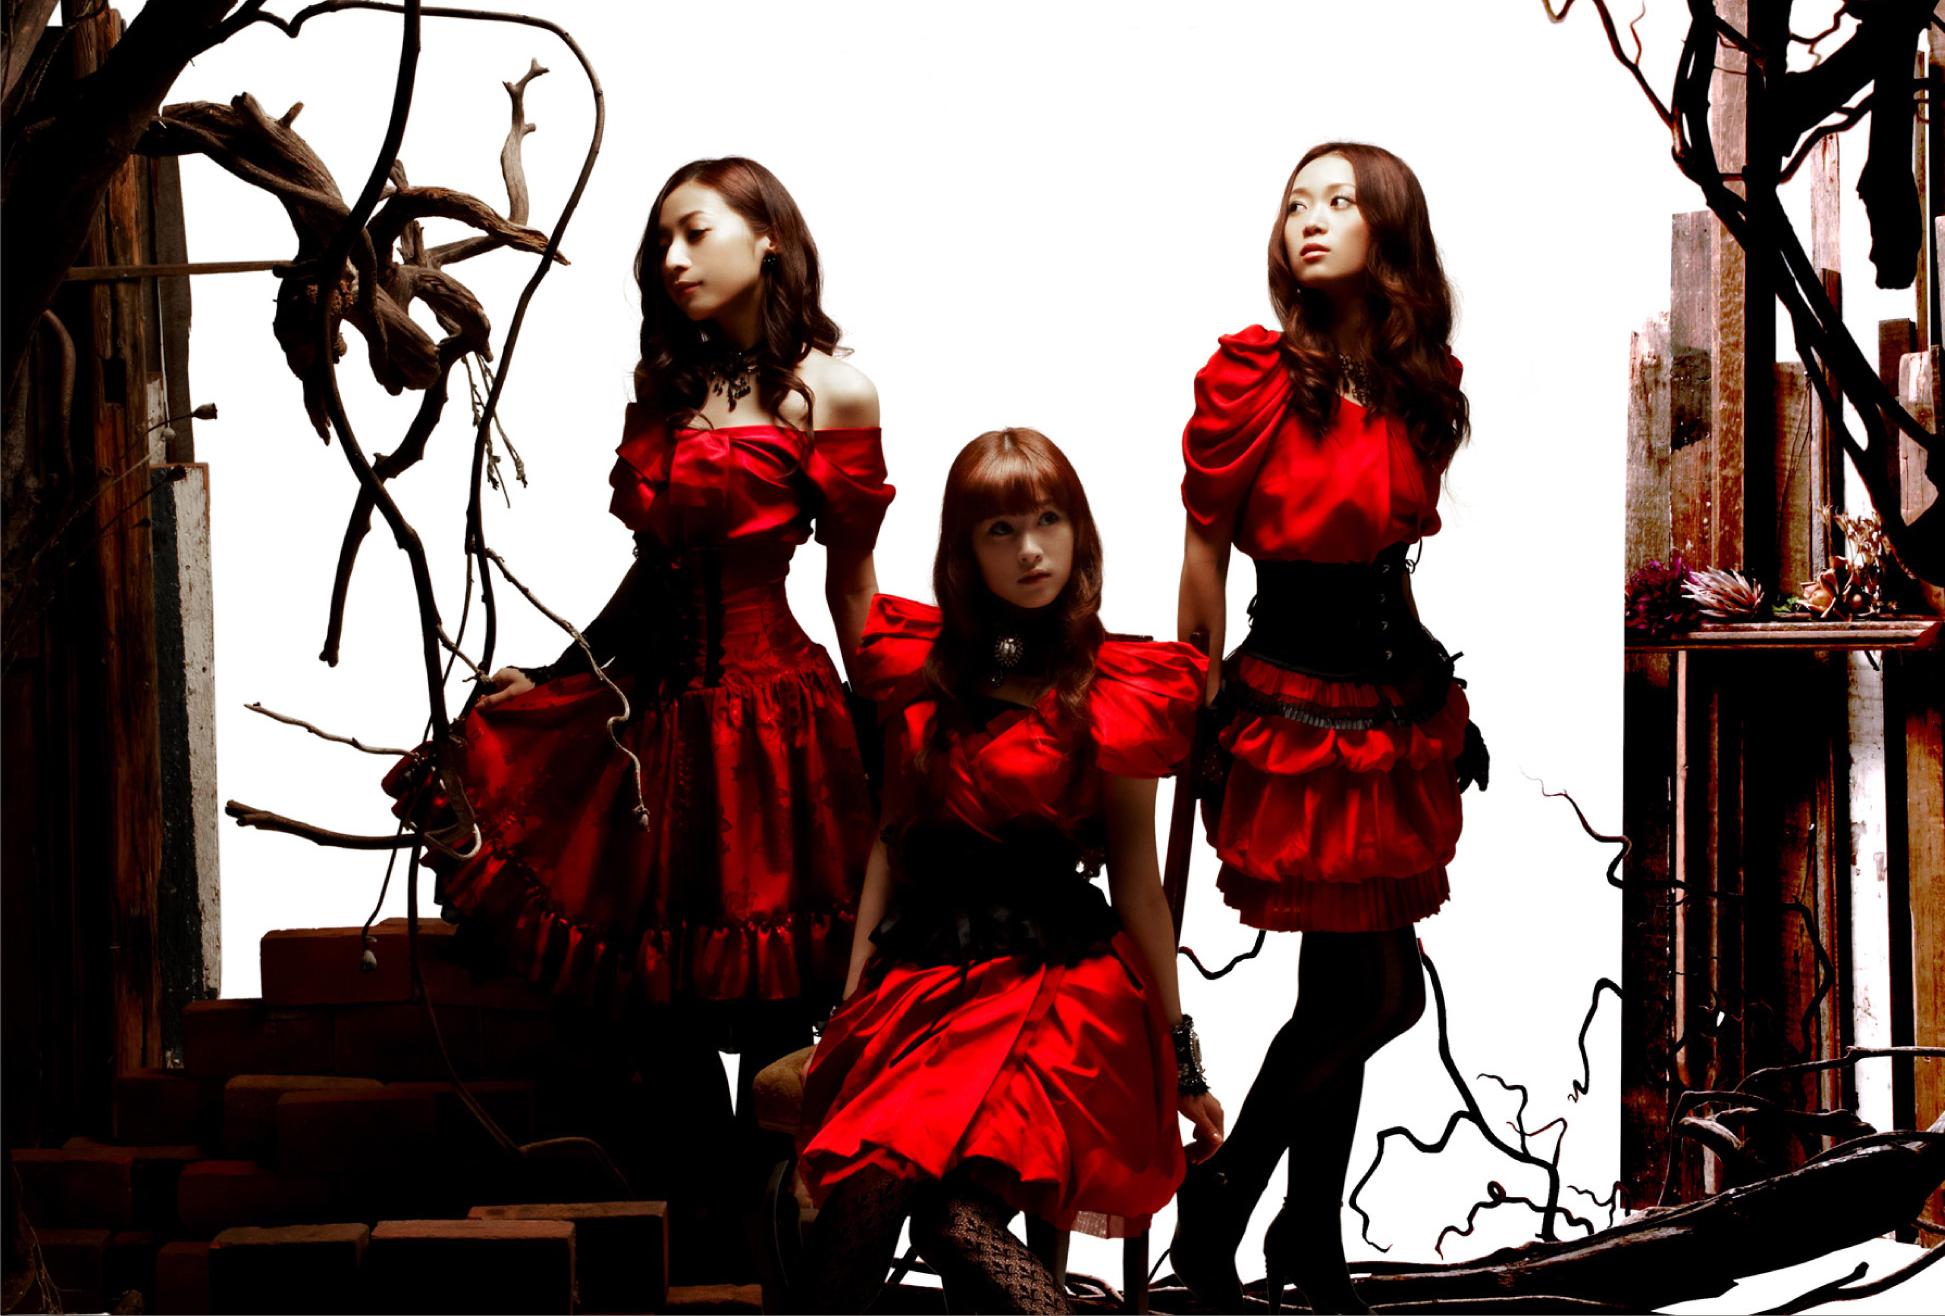 red moon inc - photo #10